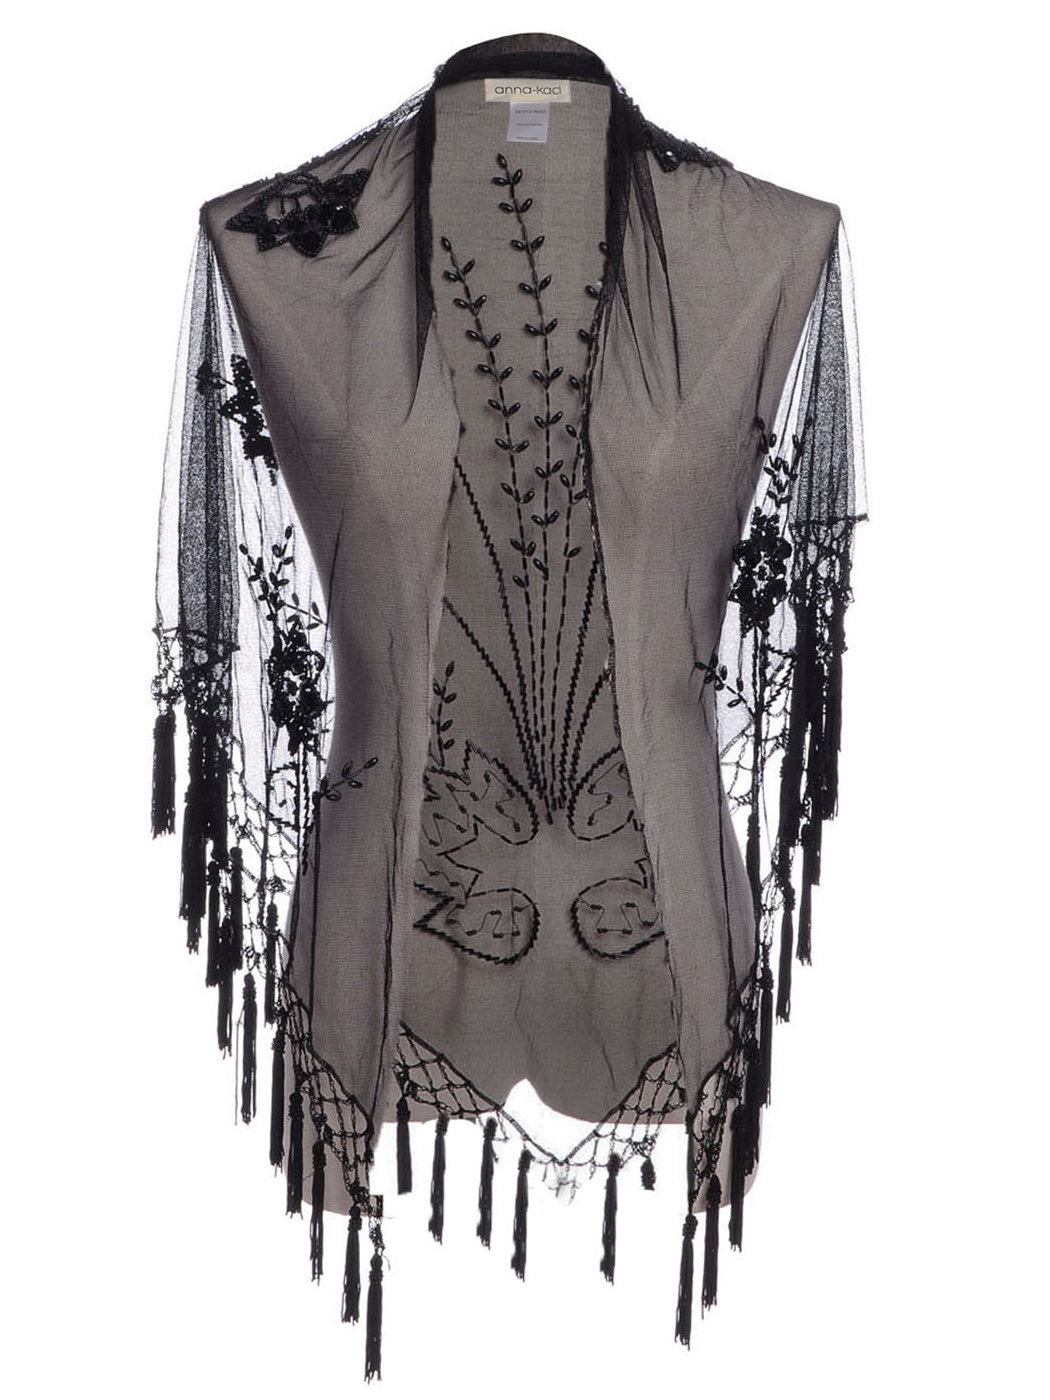 BrownBlack Kashmiri Embroidery scarfgifts for herspring wedding accessoriesBridesmaid wrapsMother\u2019s DayEid gifts